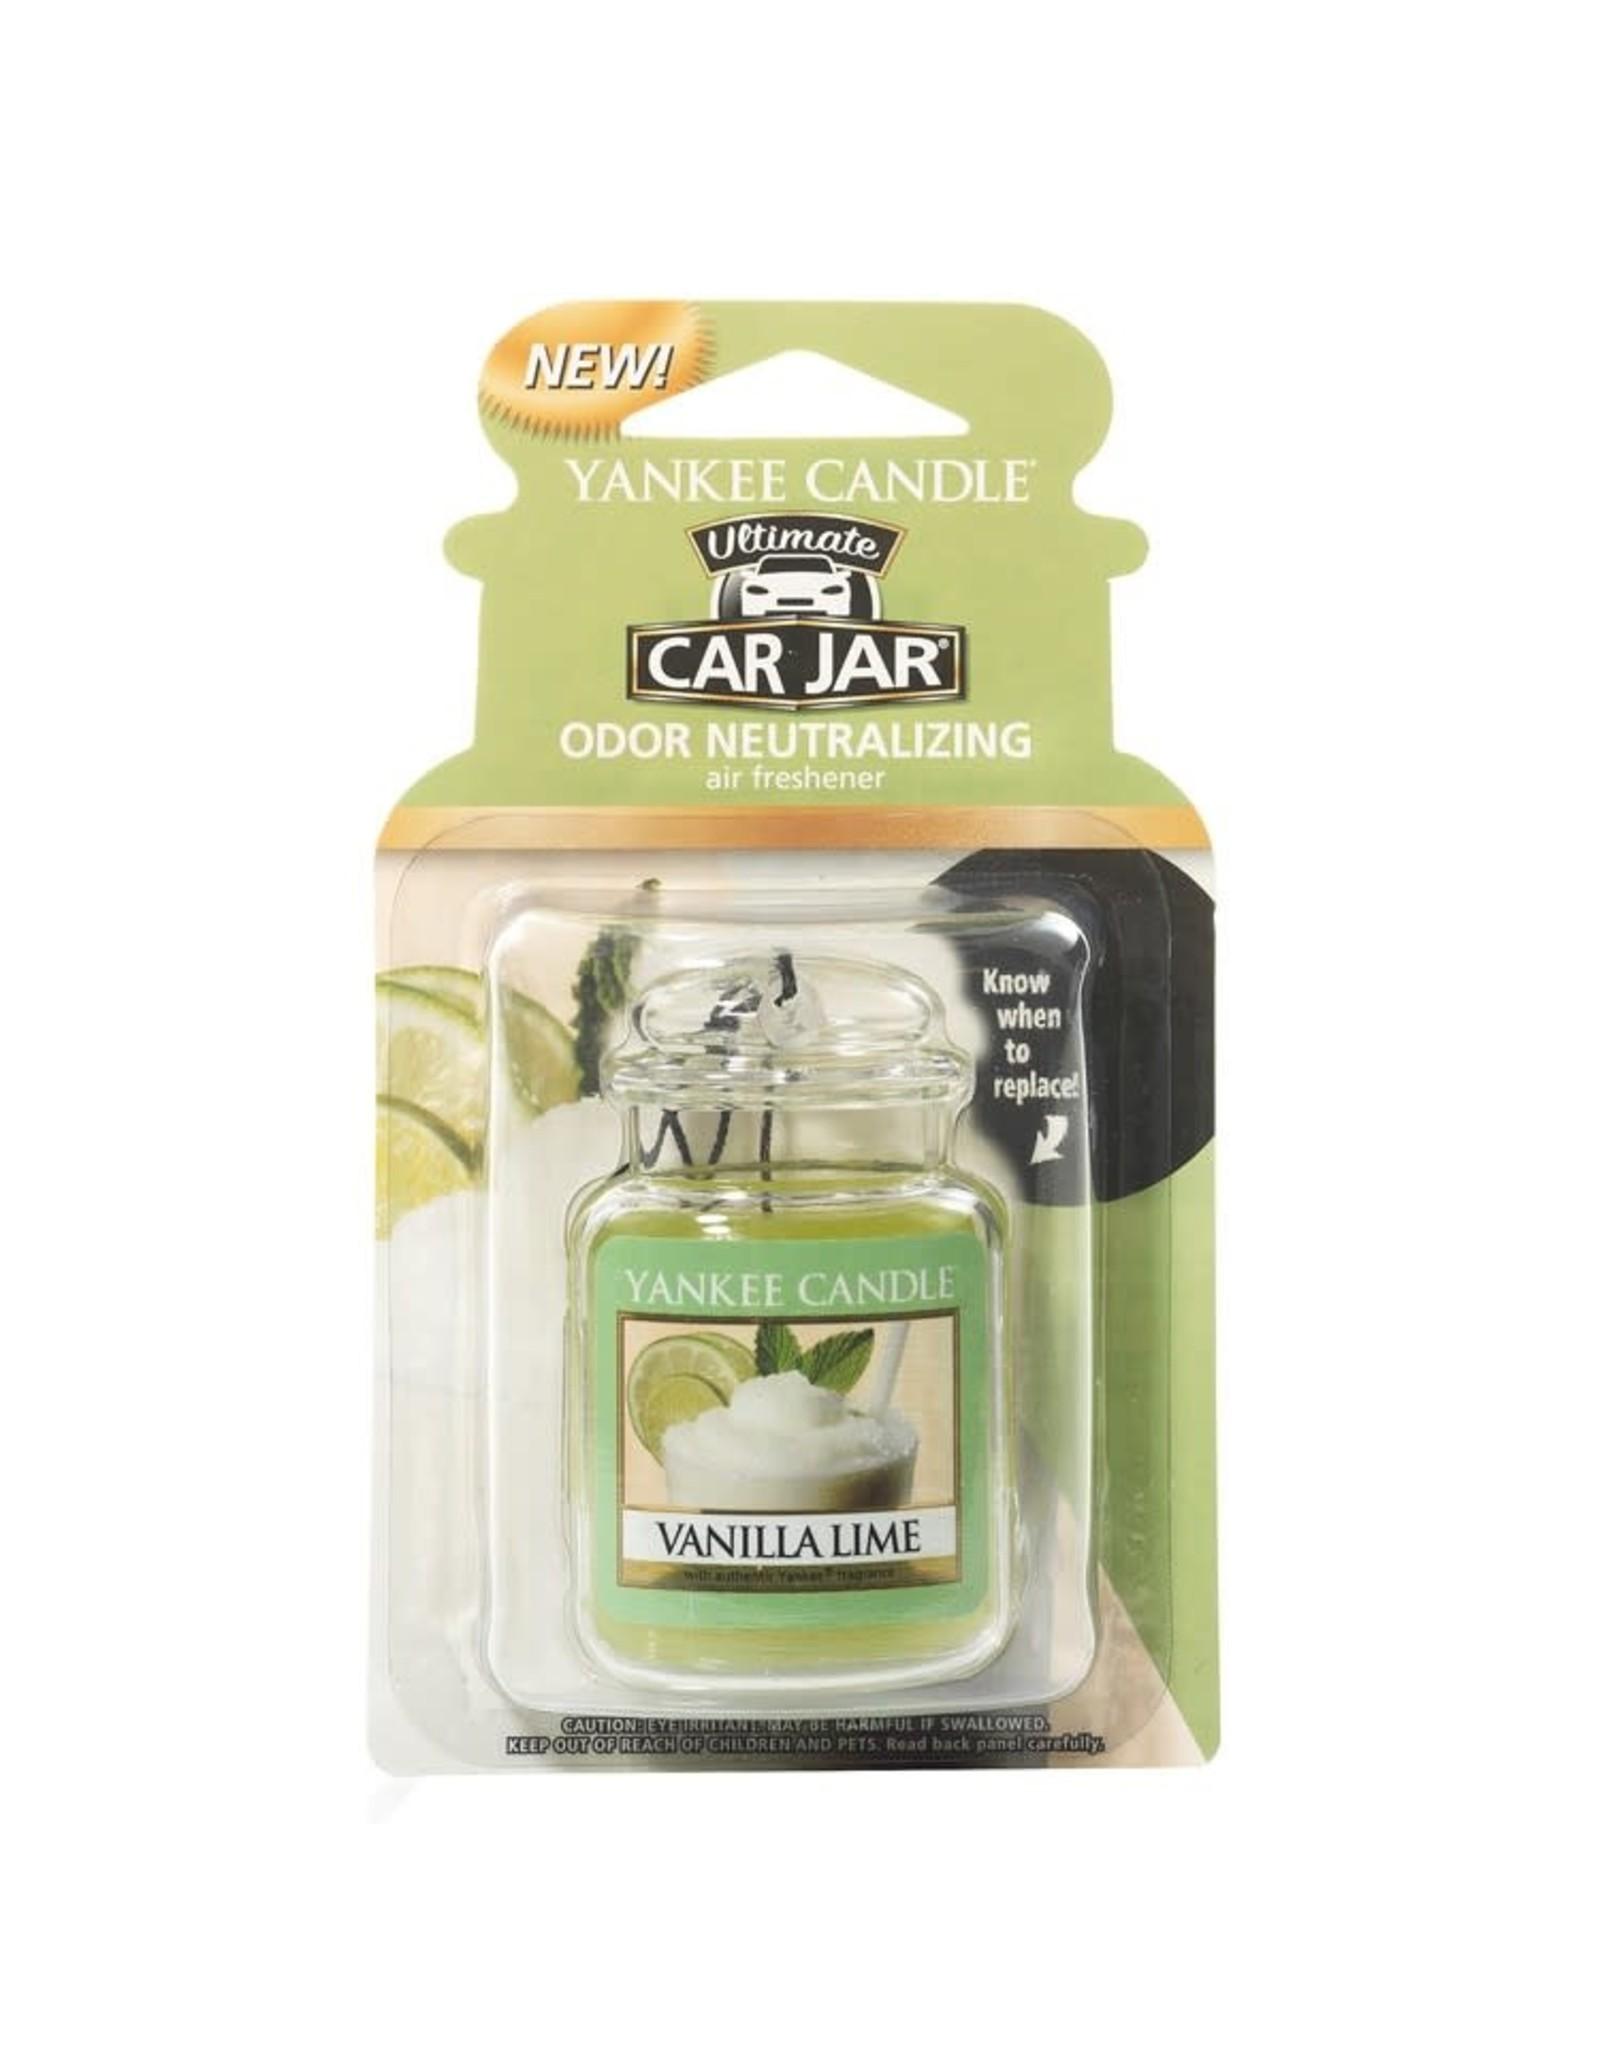 Yankee Candle Vanilla Lime Car Jar Ultimate